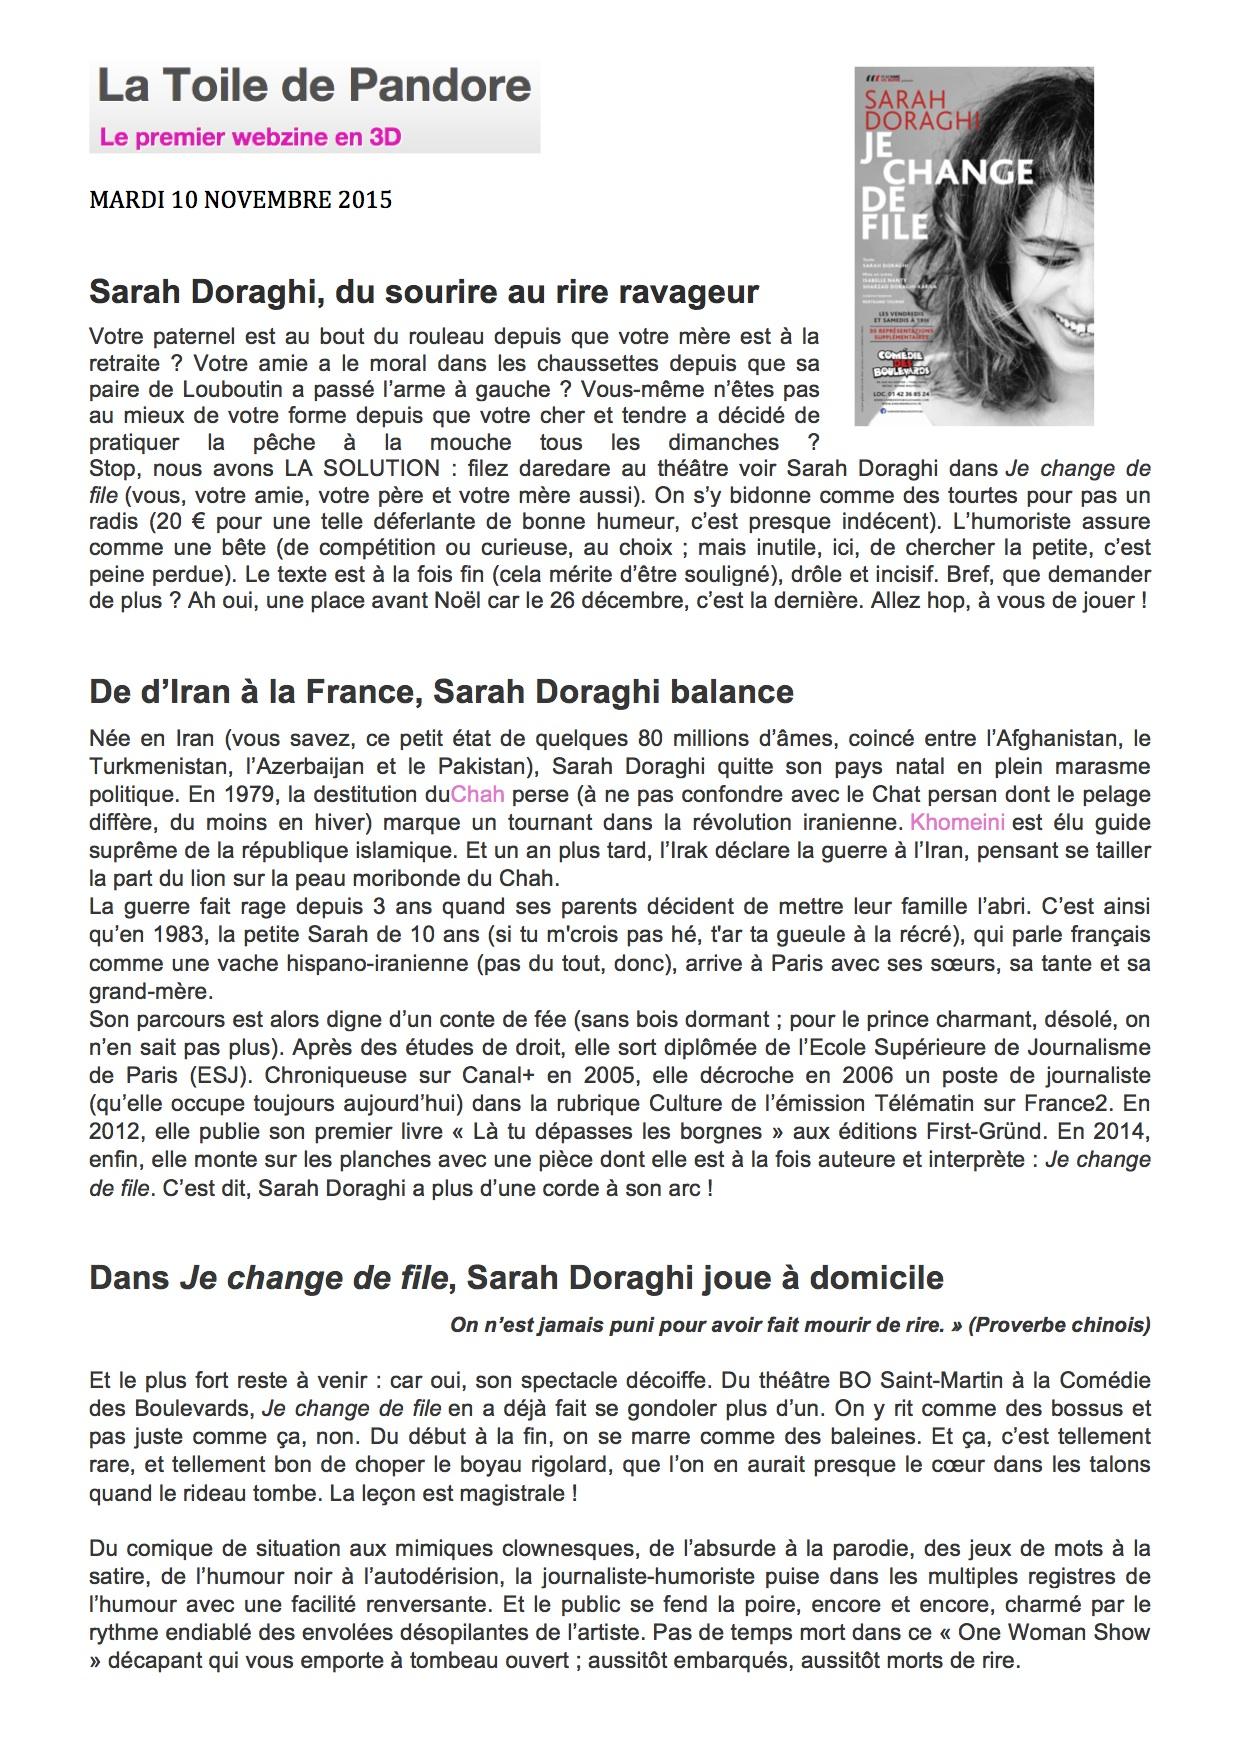 LaToiledePandore.fr p1 - 10.11.15